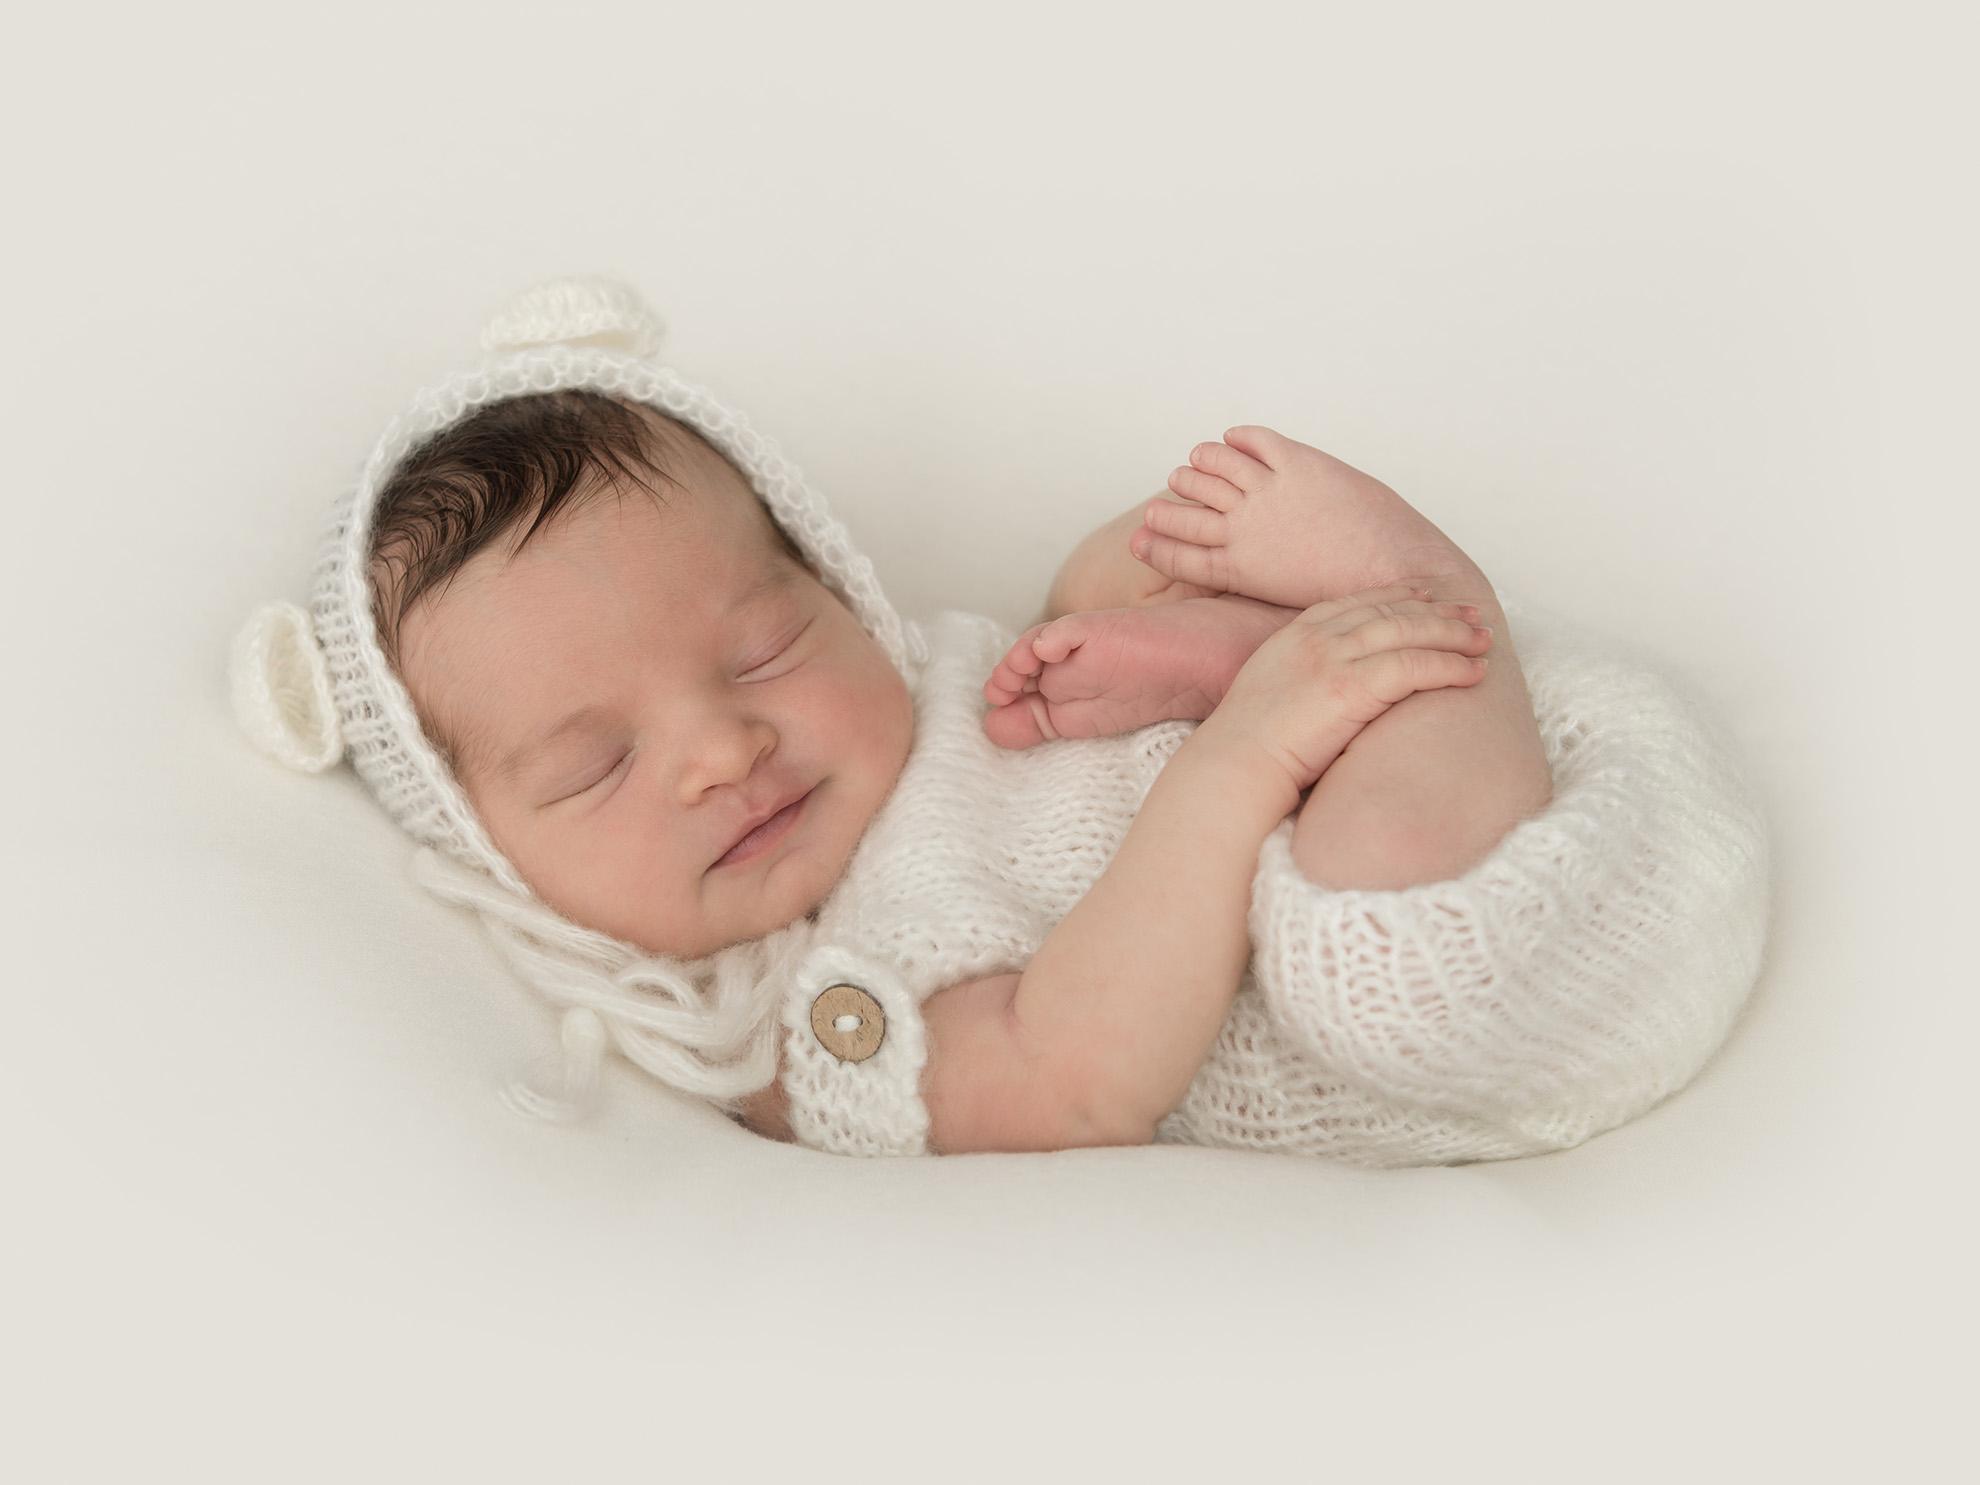 Sleeping-baby-photos.jpg